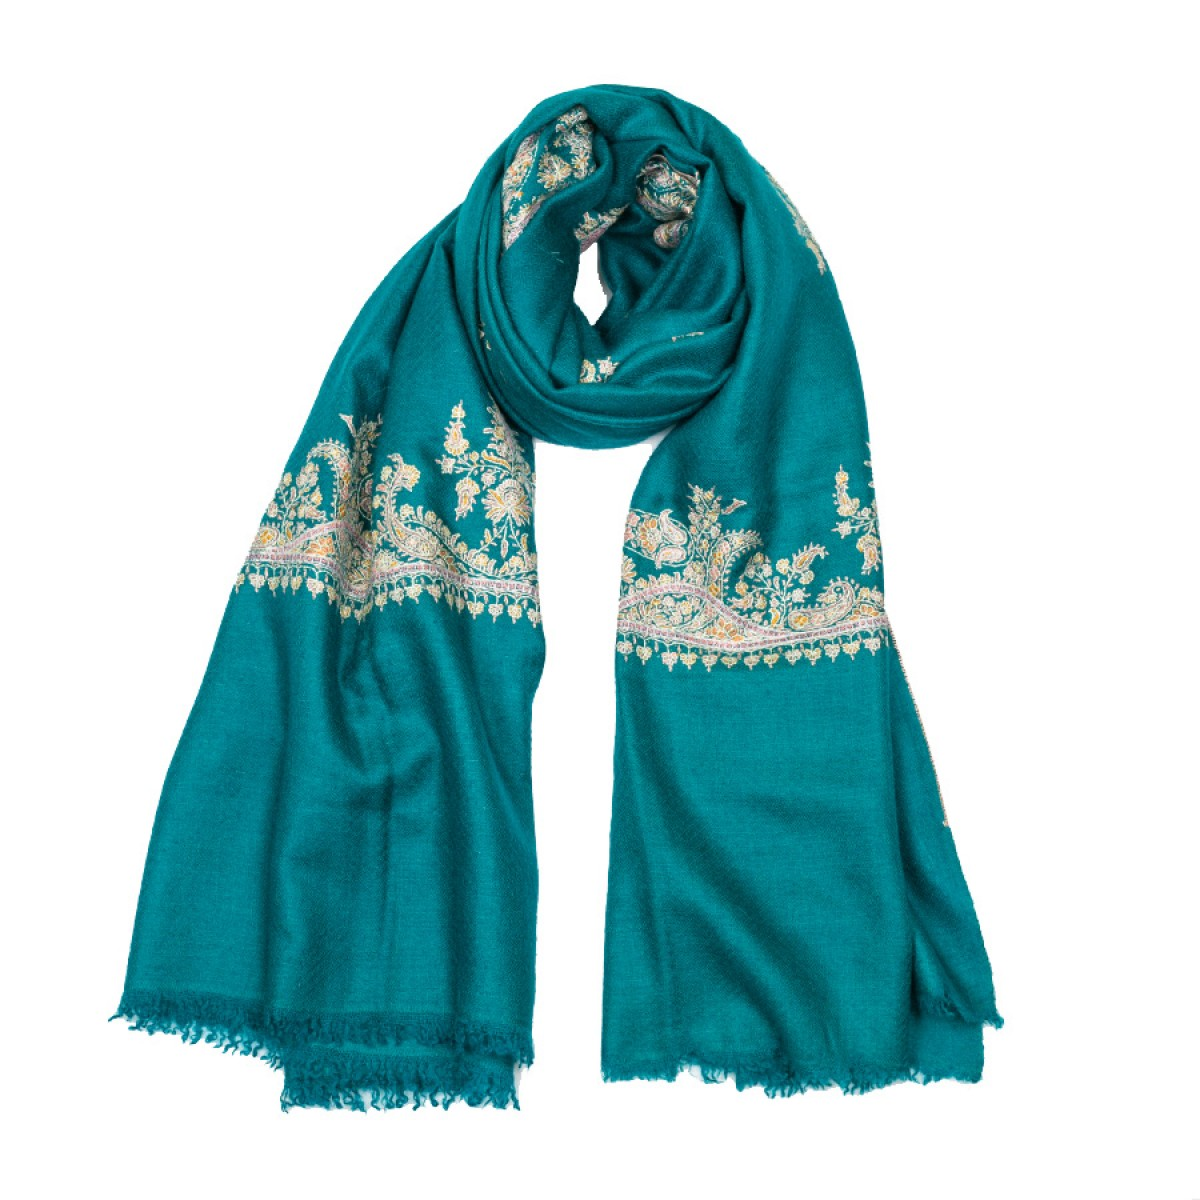 Embroidered Pashmina Shawl - Ocean